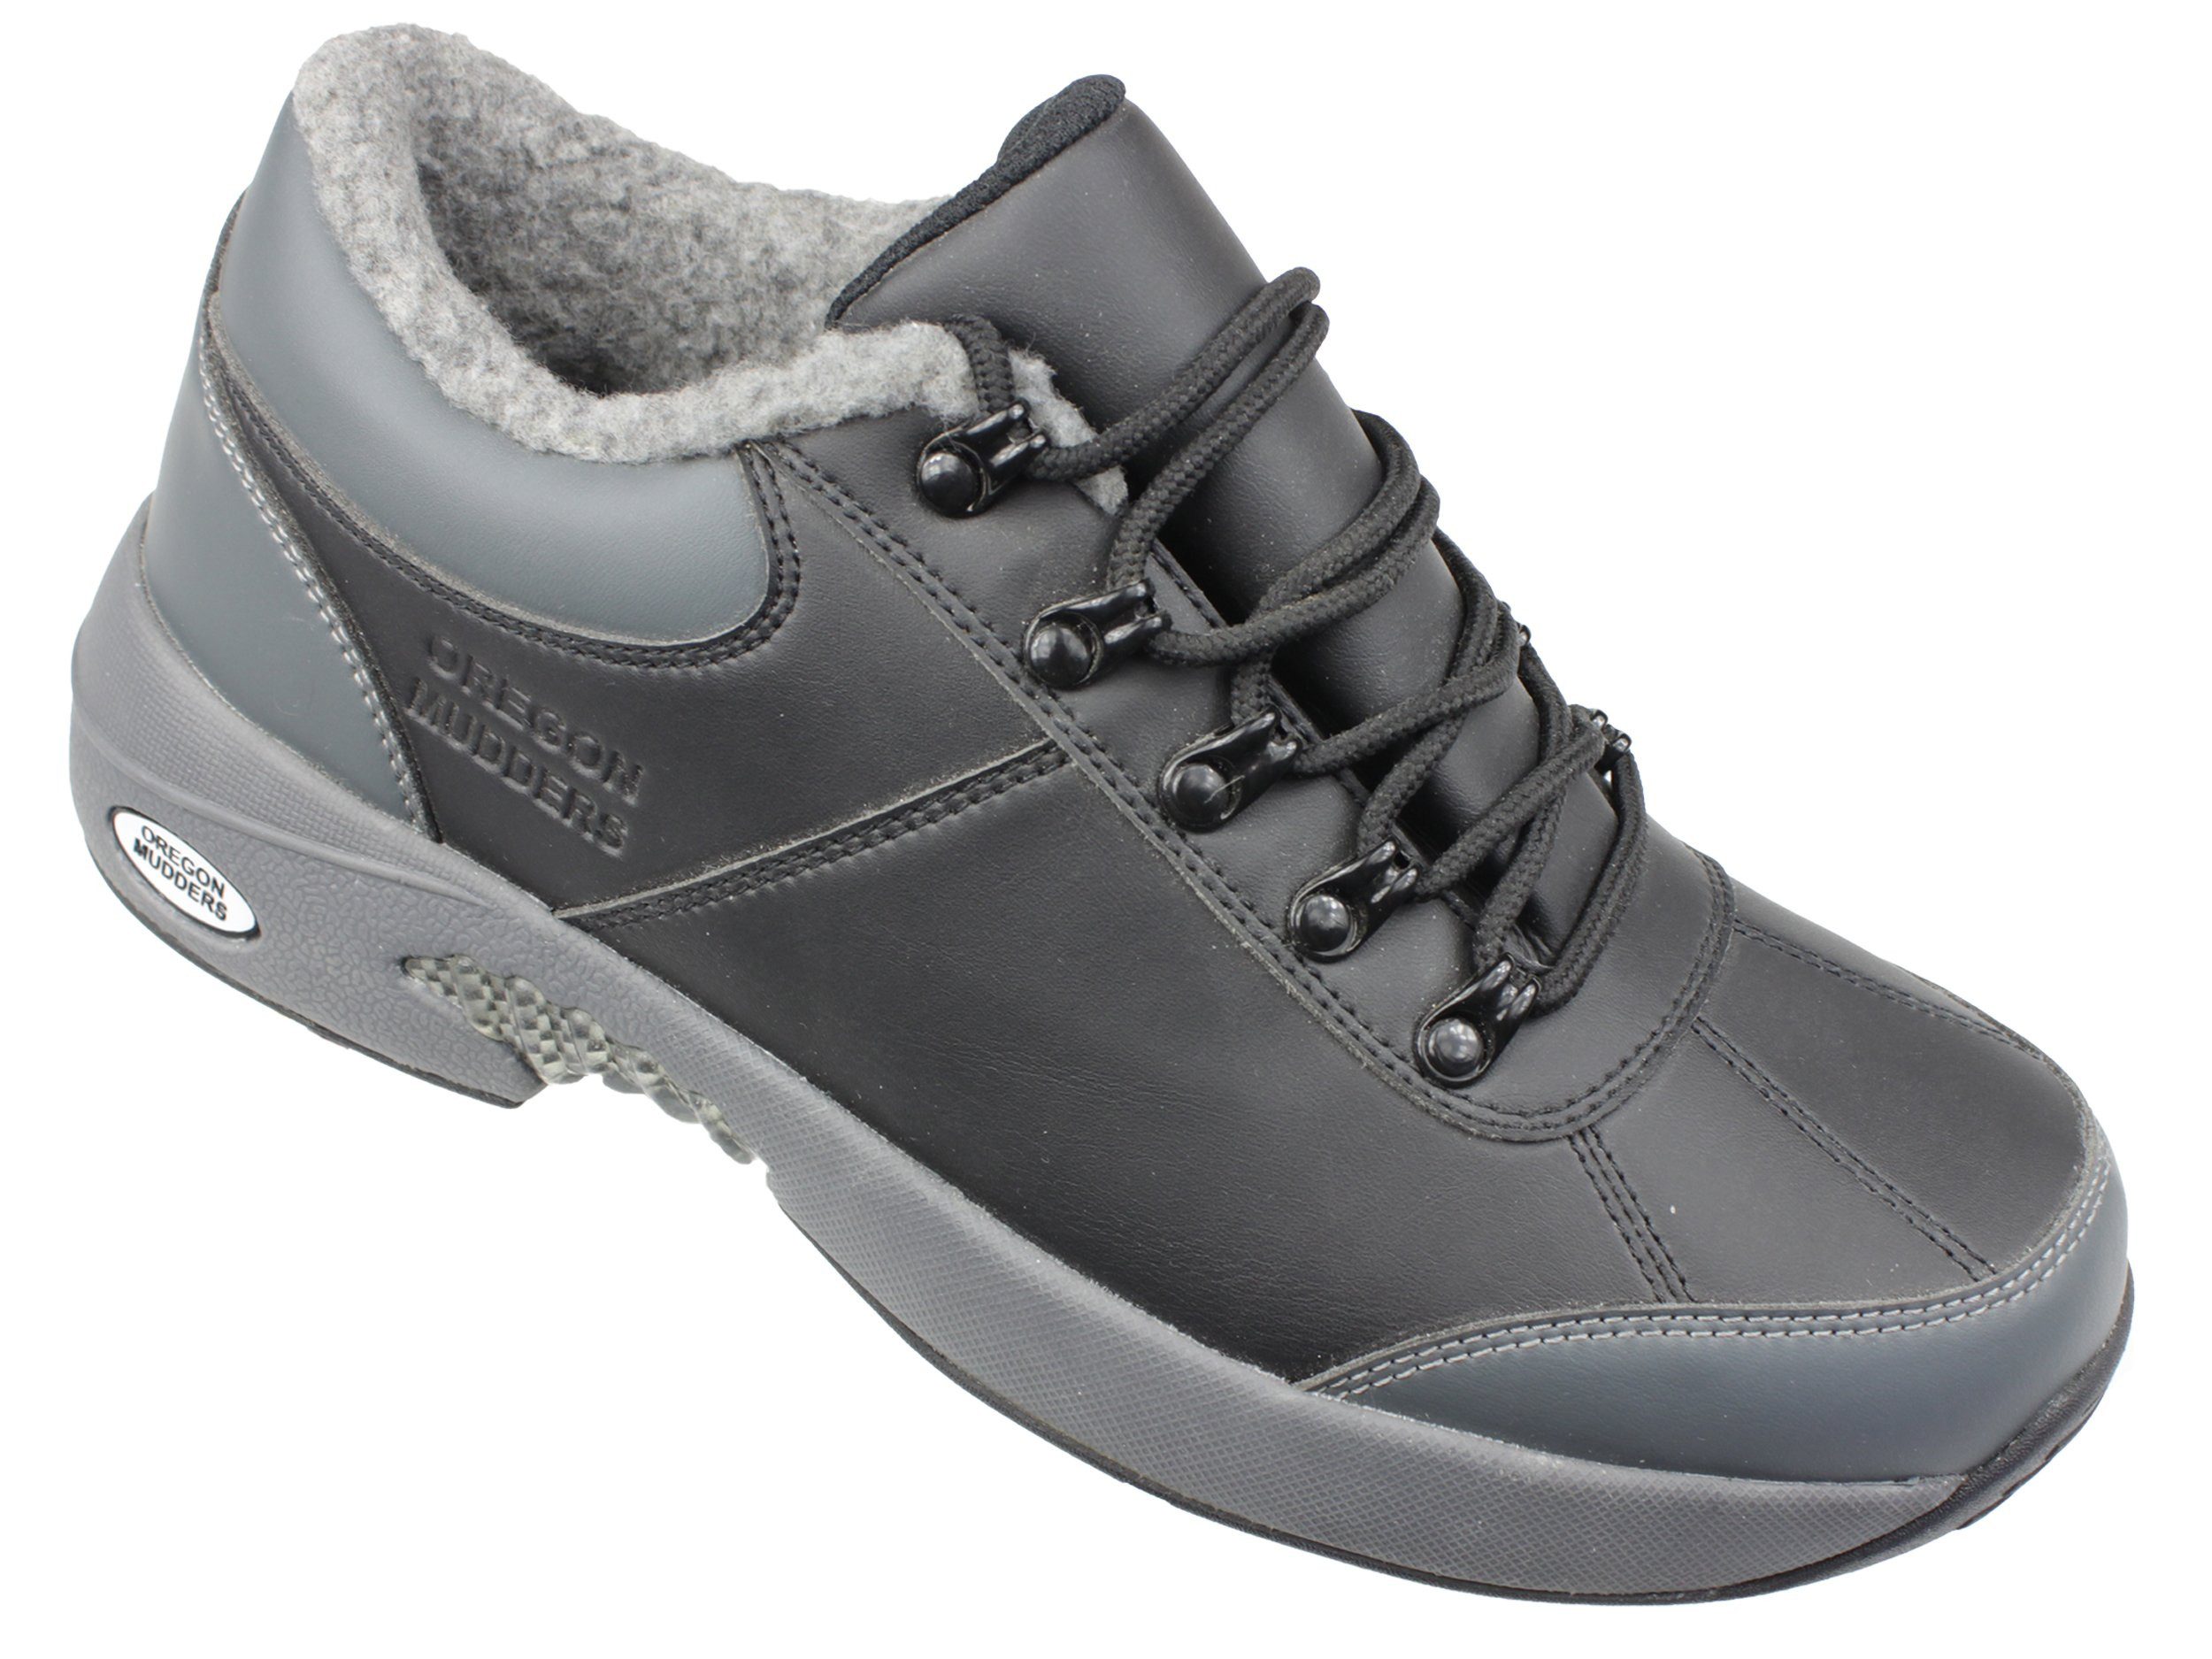 Oregon Mudders Mens CM400N Waterproof Oxford Golf Shoe with Turf Nipple Sole 10.5M US Mens Grey by Oregon Mudders